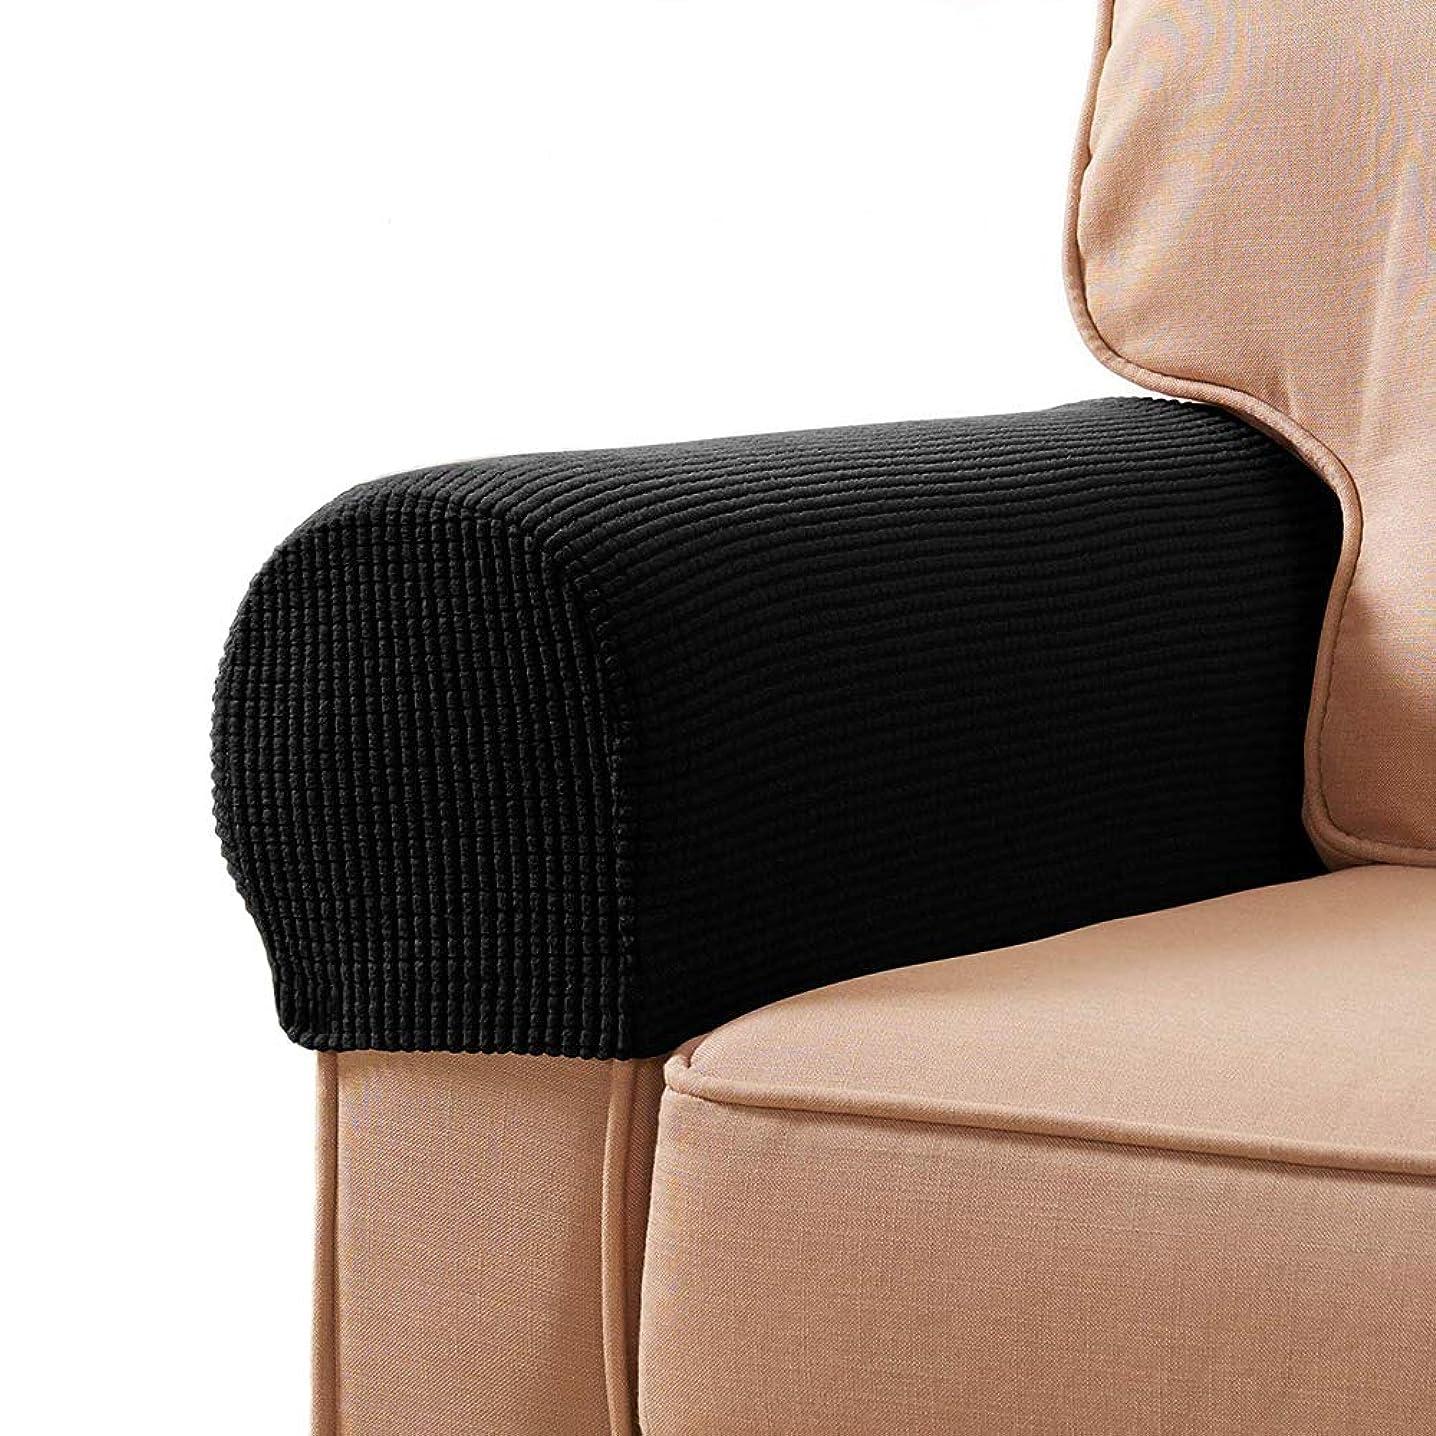 Veronica Spandex Stretch Armrest Covers Set of 2 (Black)